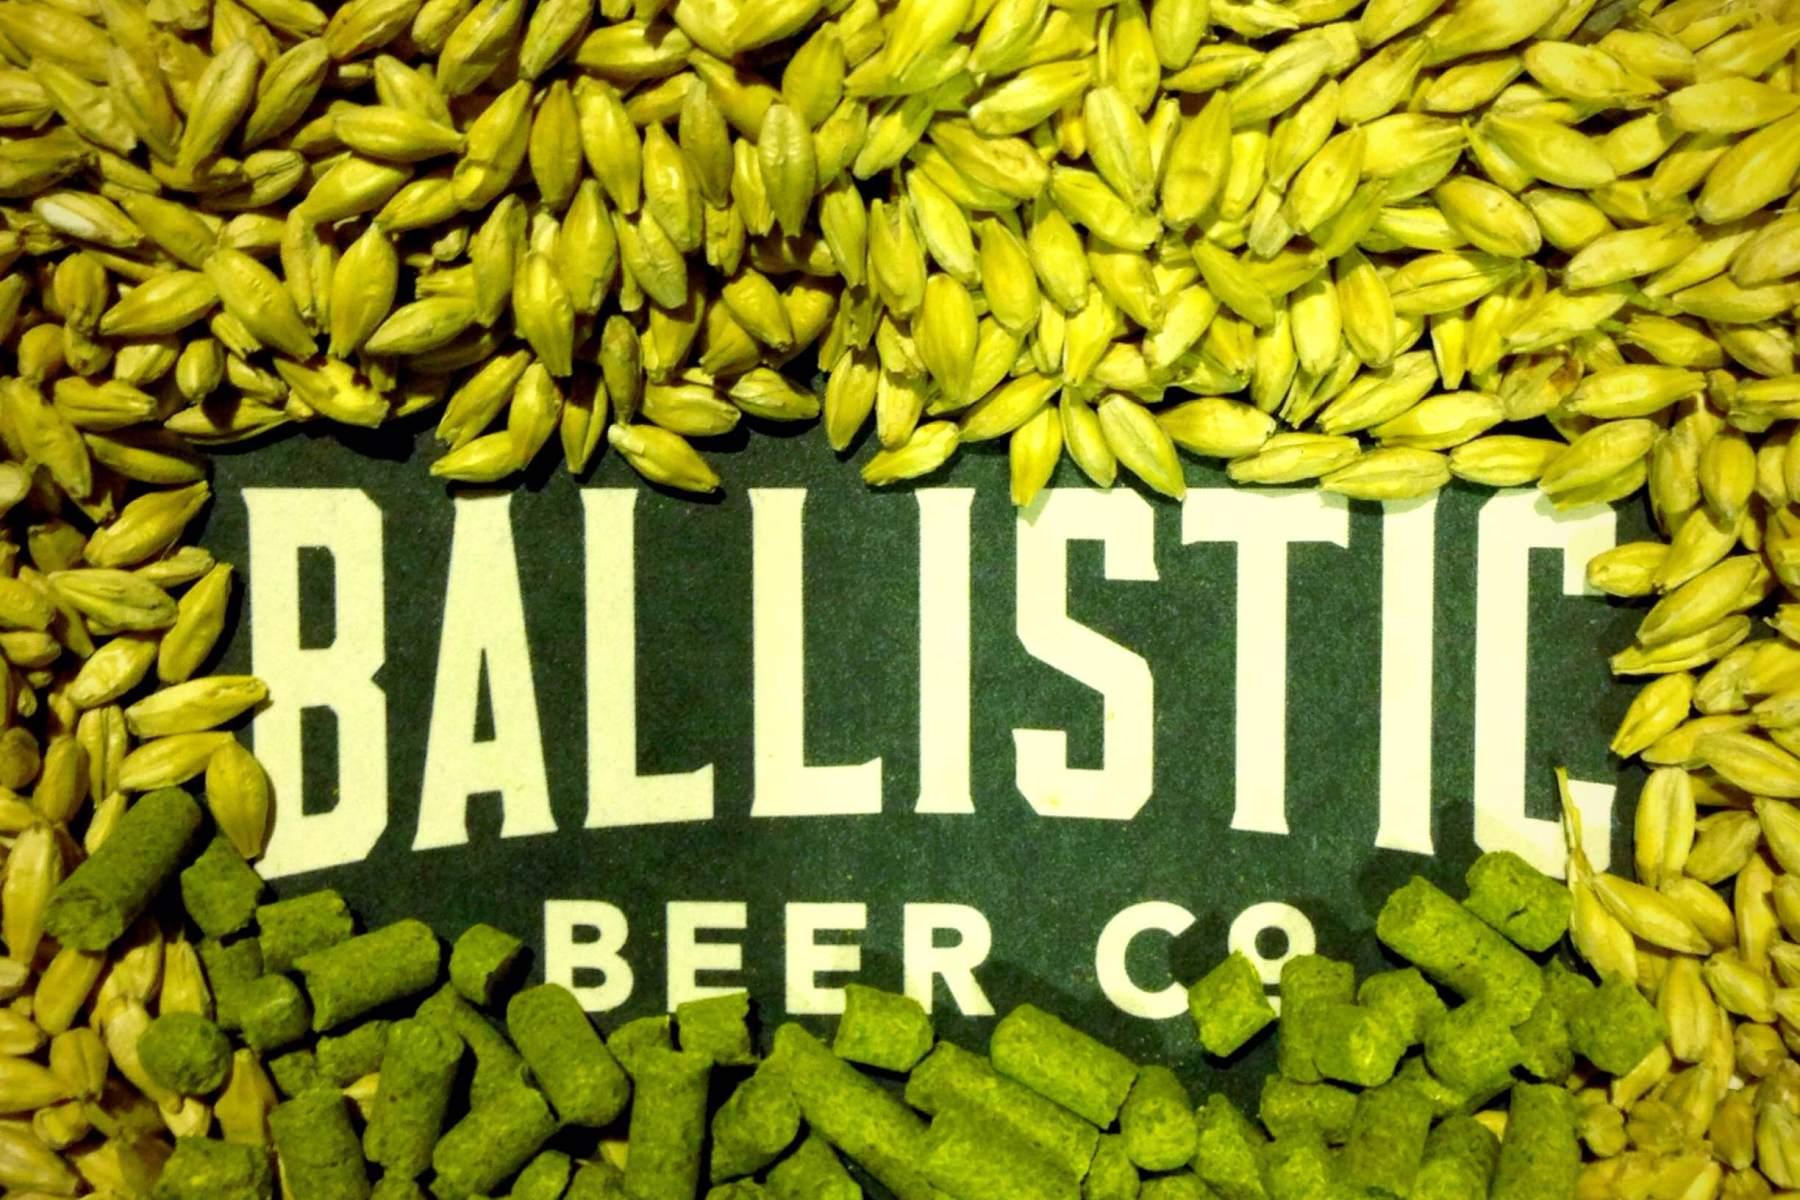 Ballistic Beer Co - Malt & Hops